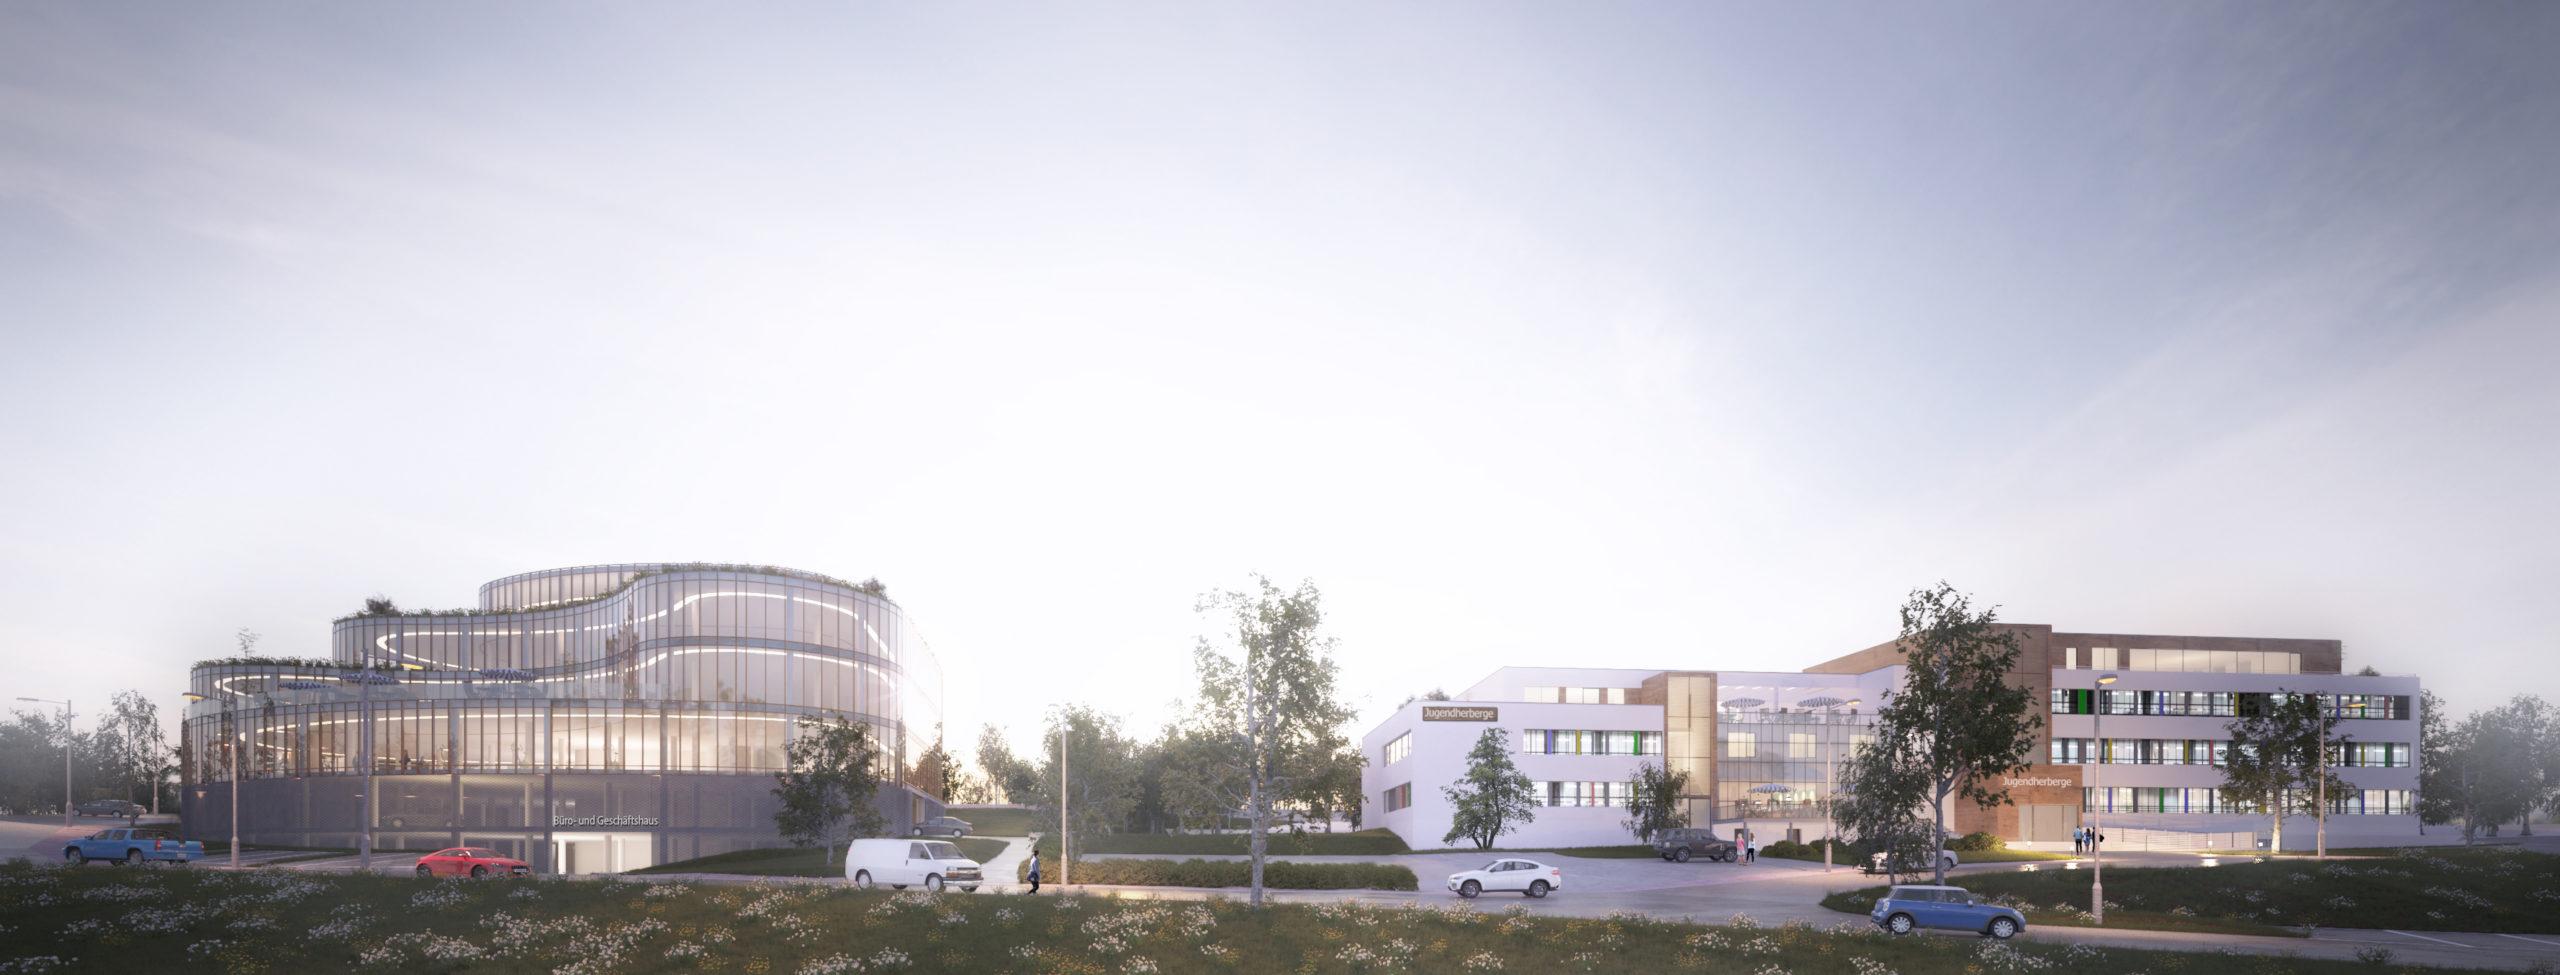 Bürogebäude und Jugendherberge Bernkastel-Kues